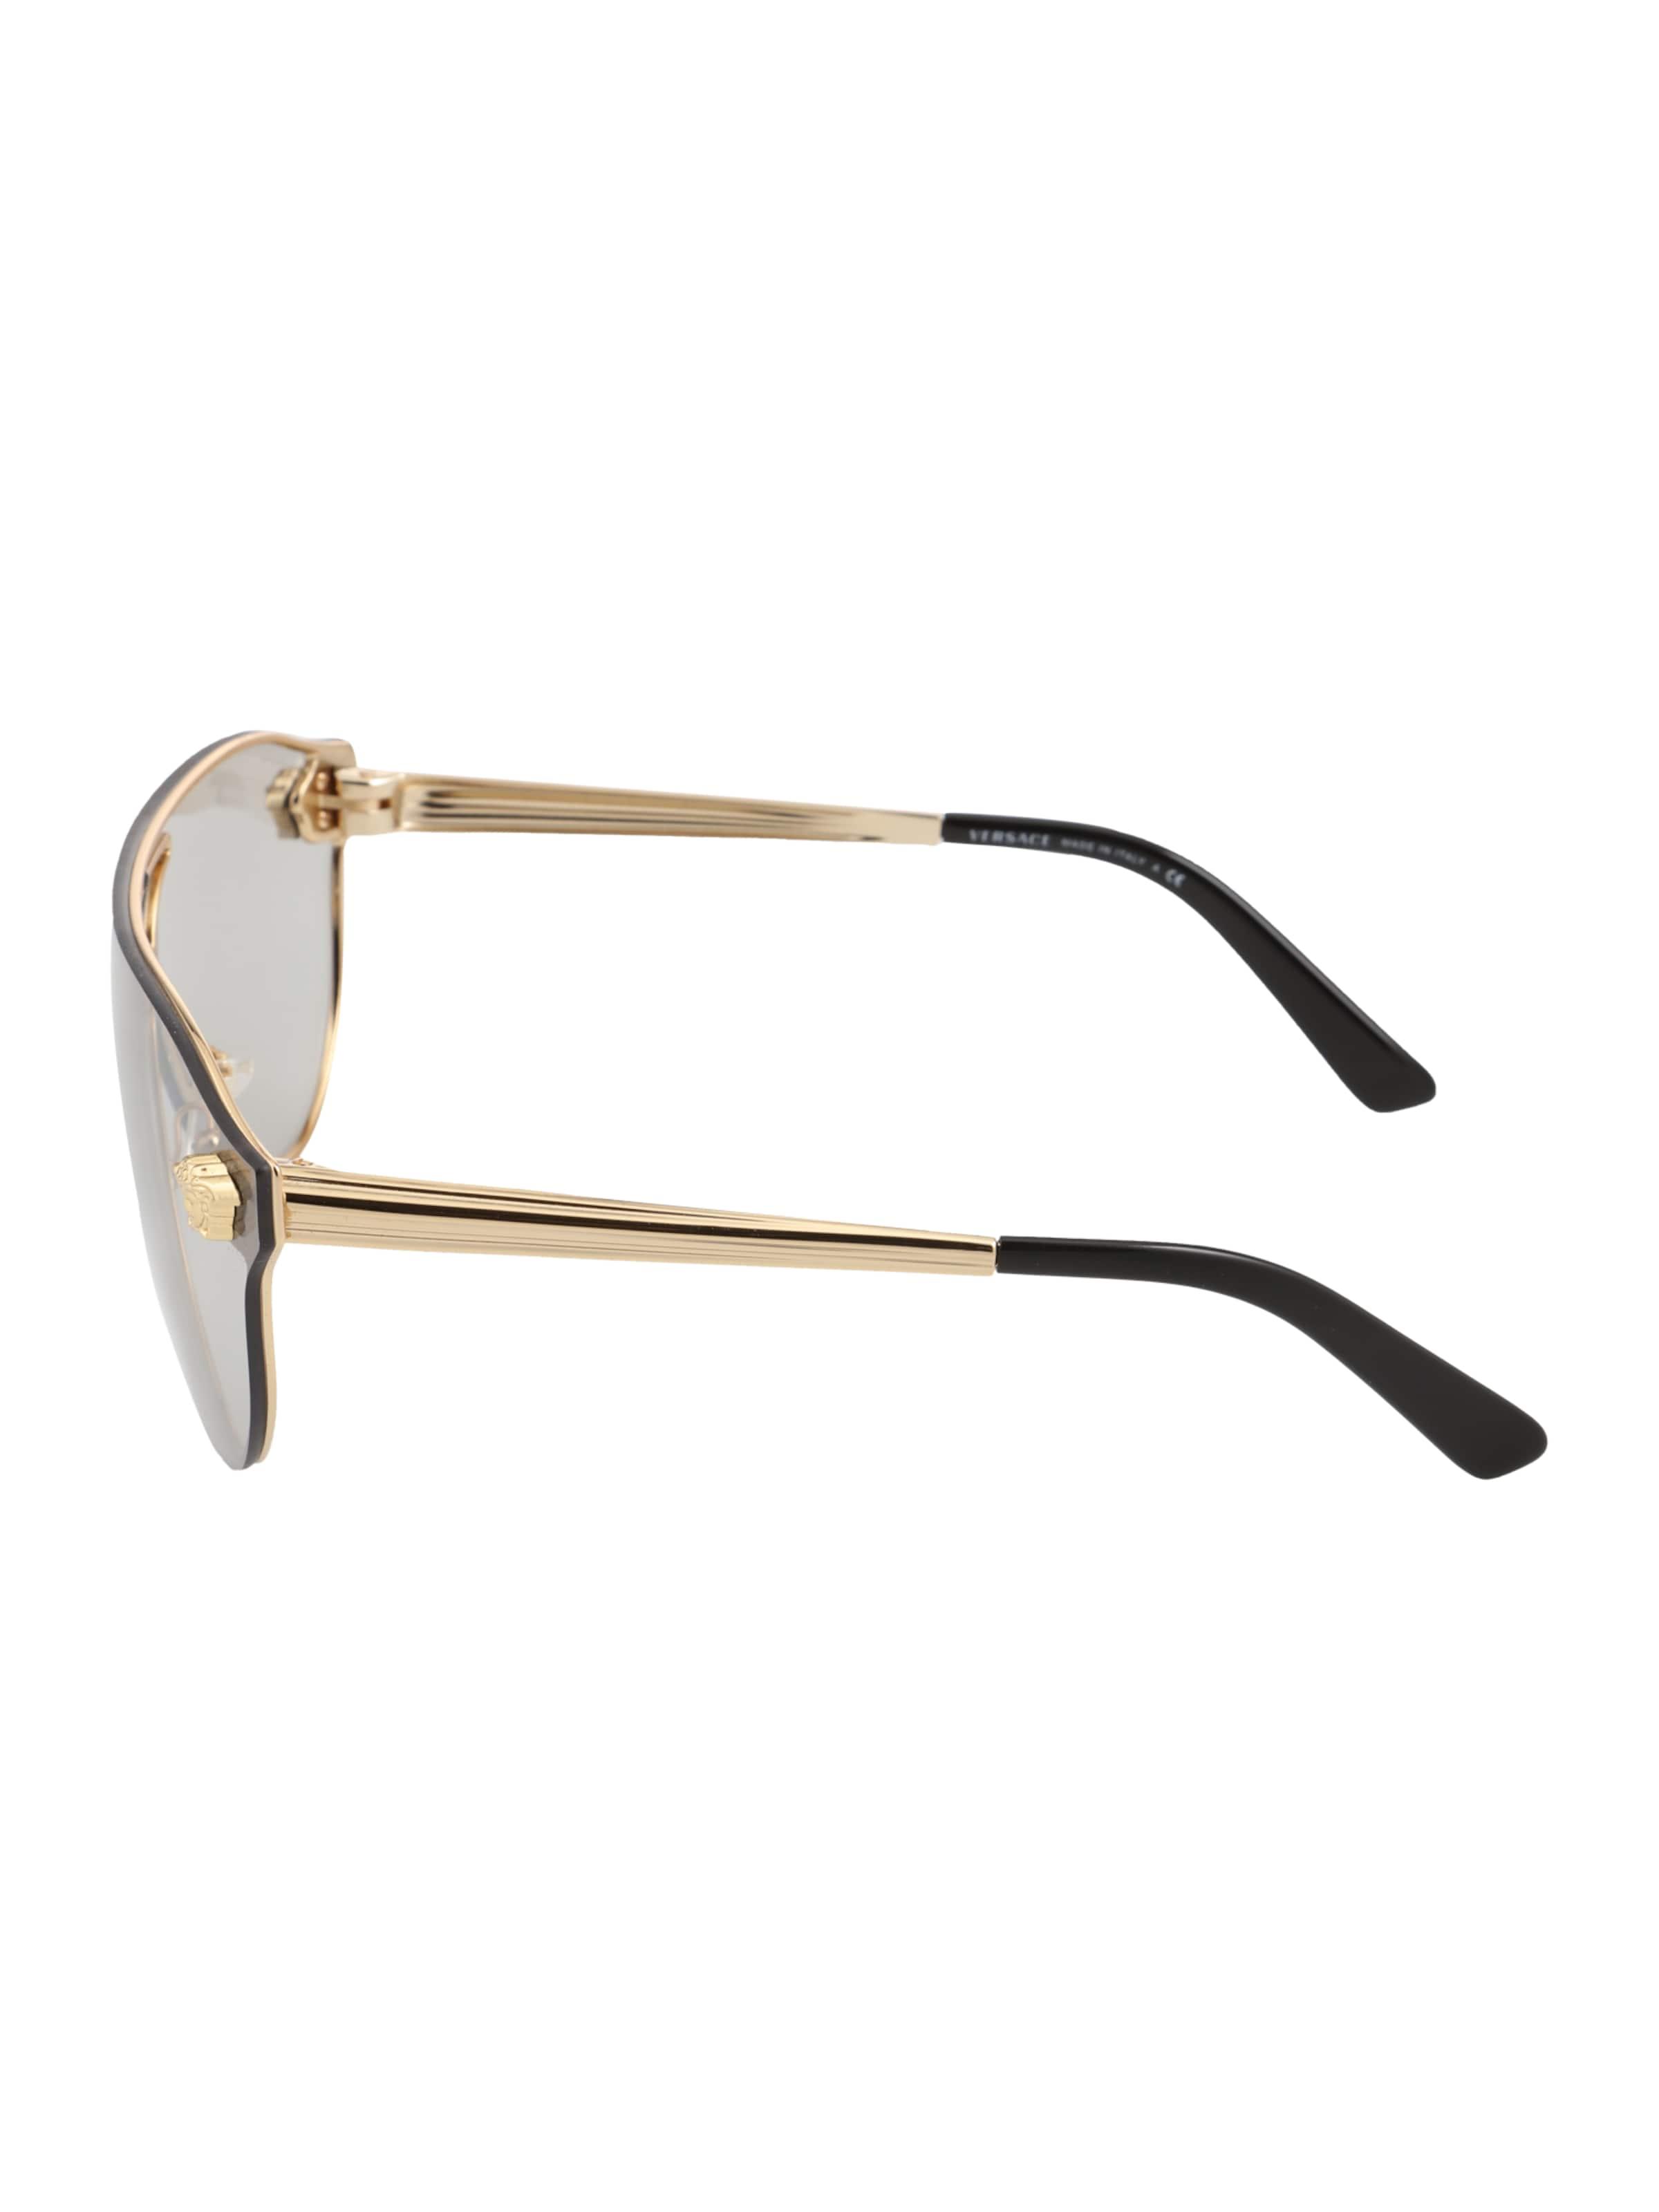 VERSACE Casual Sonnenbrille Footlocker Bilder Online R1Vfivt3L